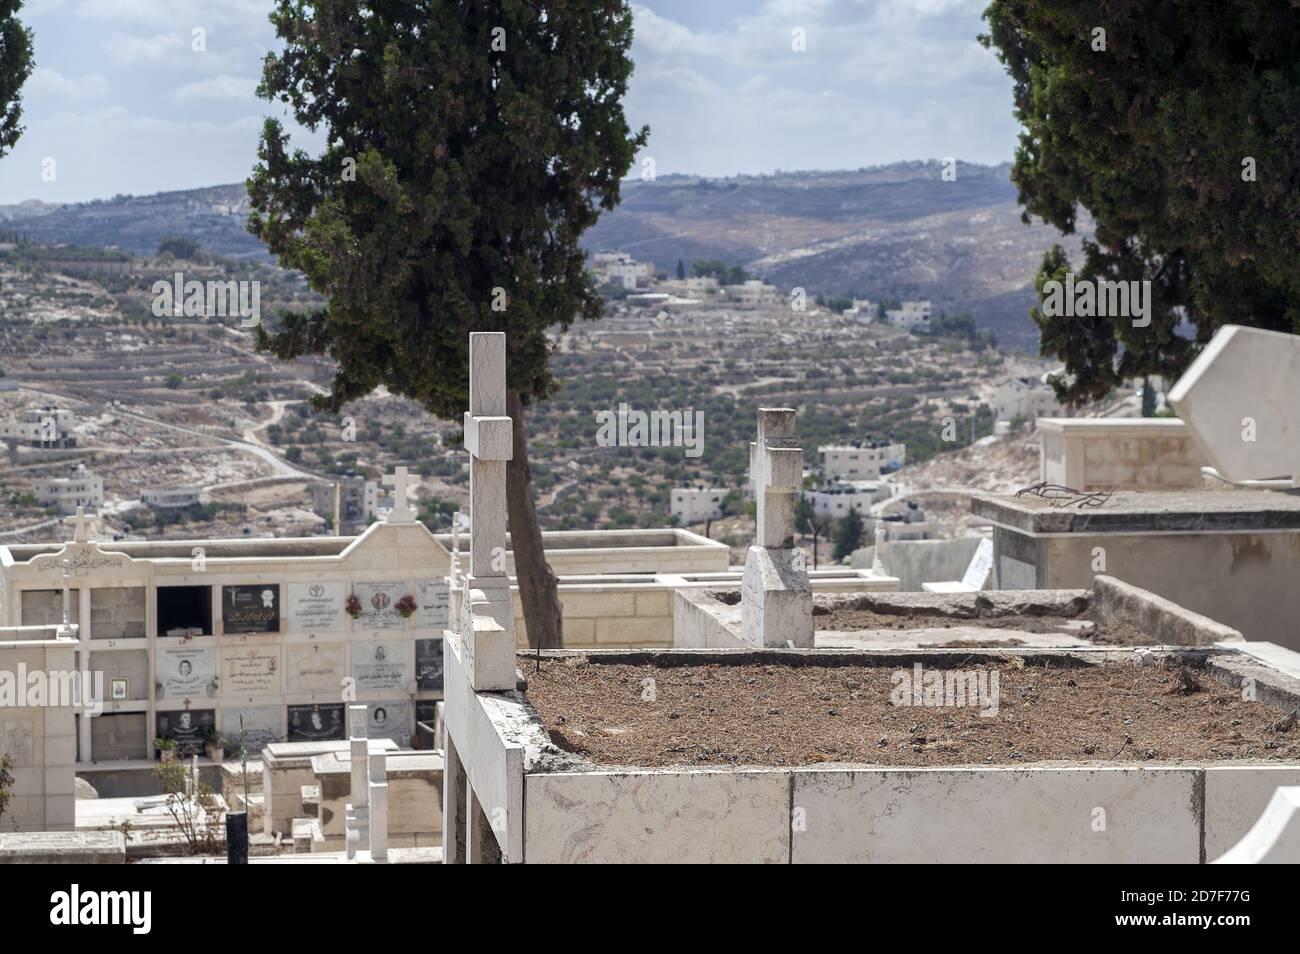 Bethlehem, בית לחם, Palestine, بيت لحم, Israel, Izrael, ישראל, Palestyna, دولة فلسطين; Christian cemetery. Cementerio cristiano. Christlicher Friedhof Stock Photo